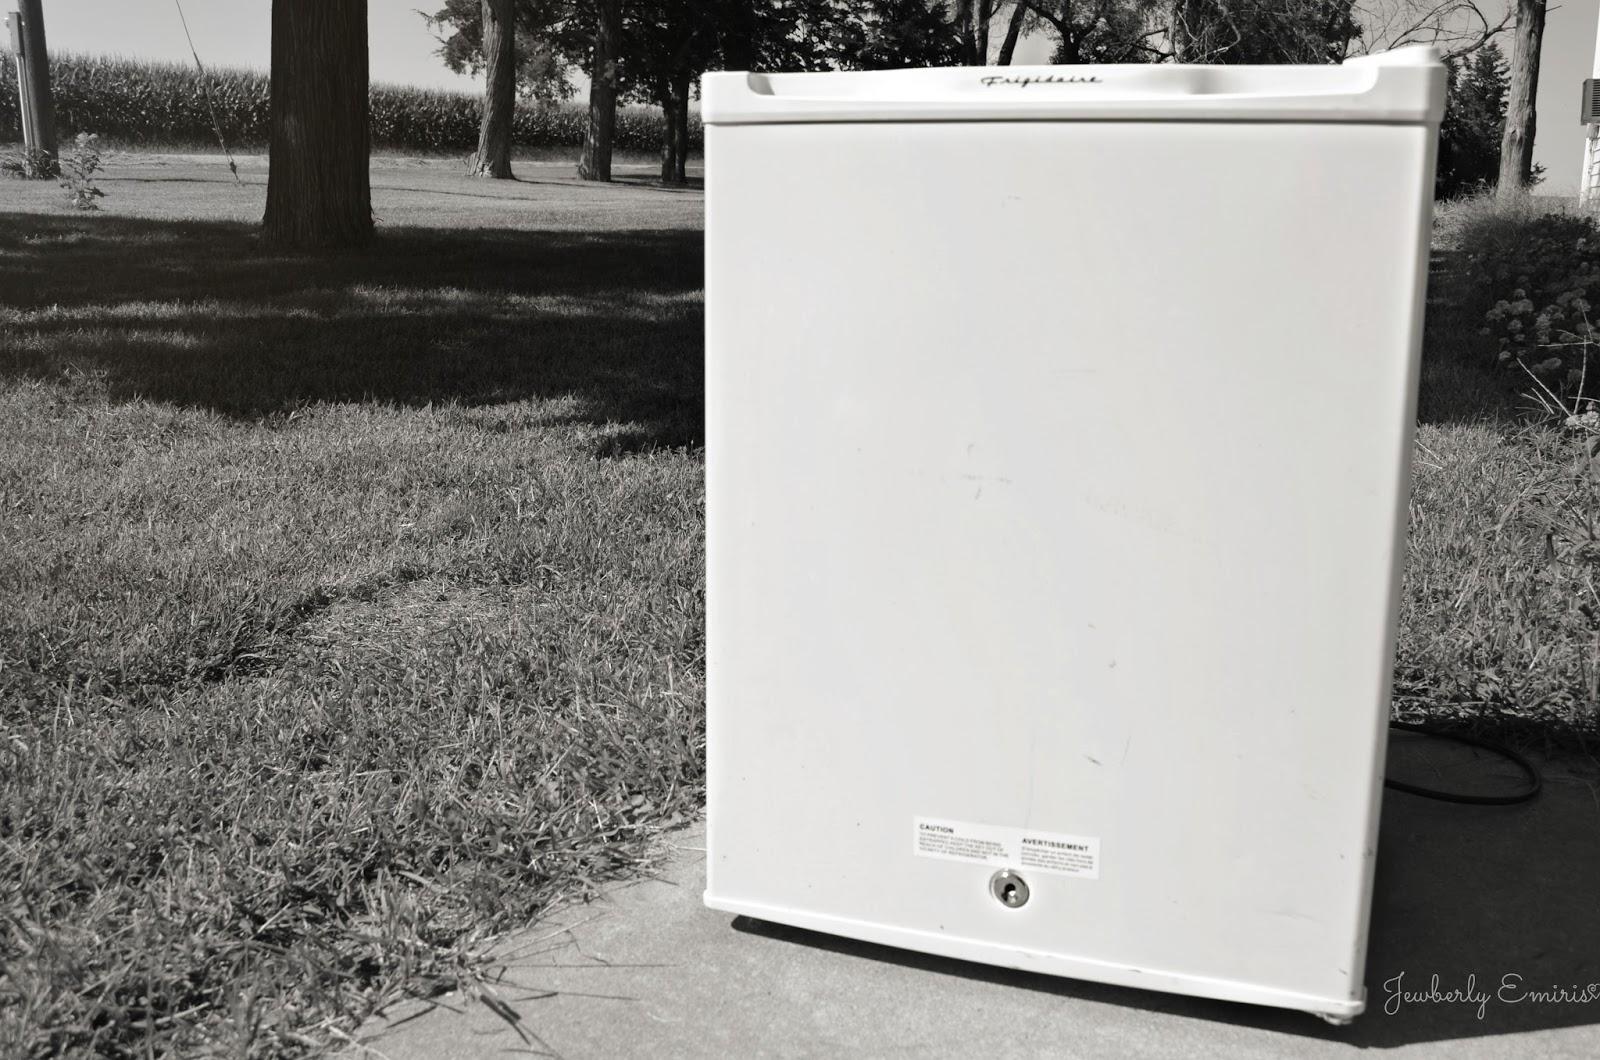 Jewberly emiris garage sale score frigidaire mini fridge for Garage mini 77